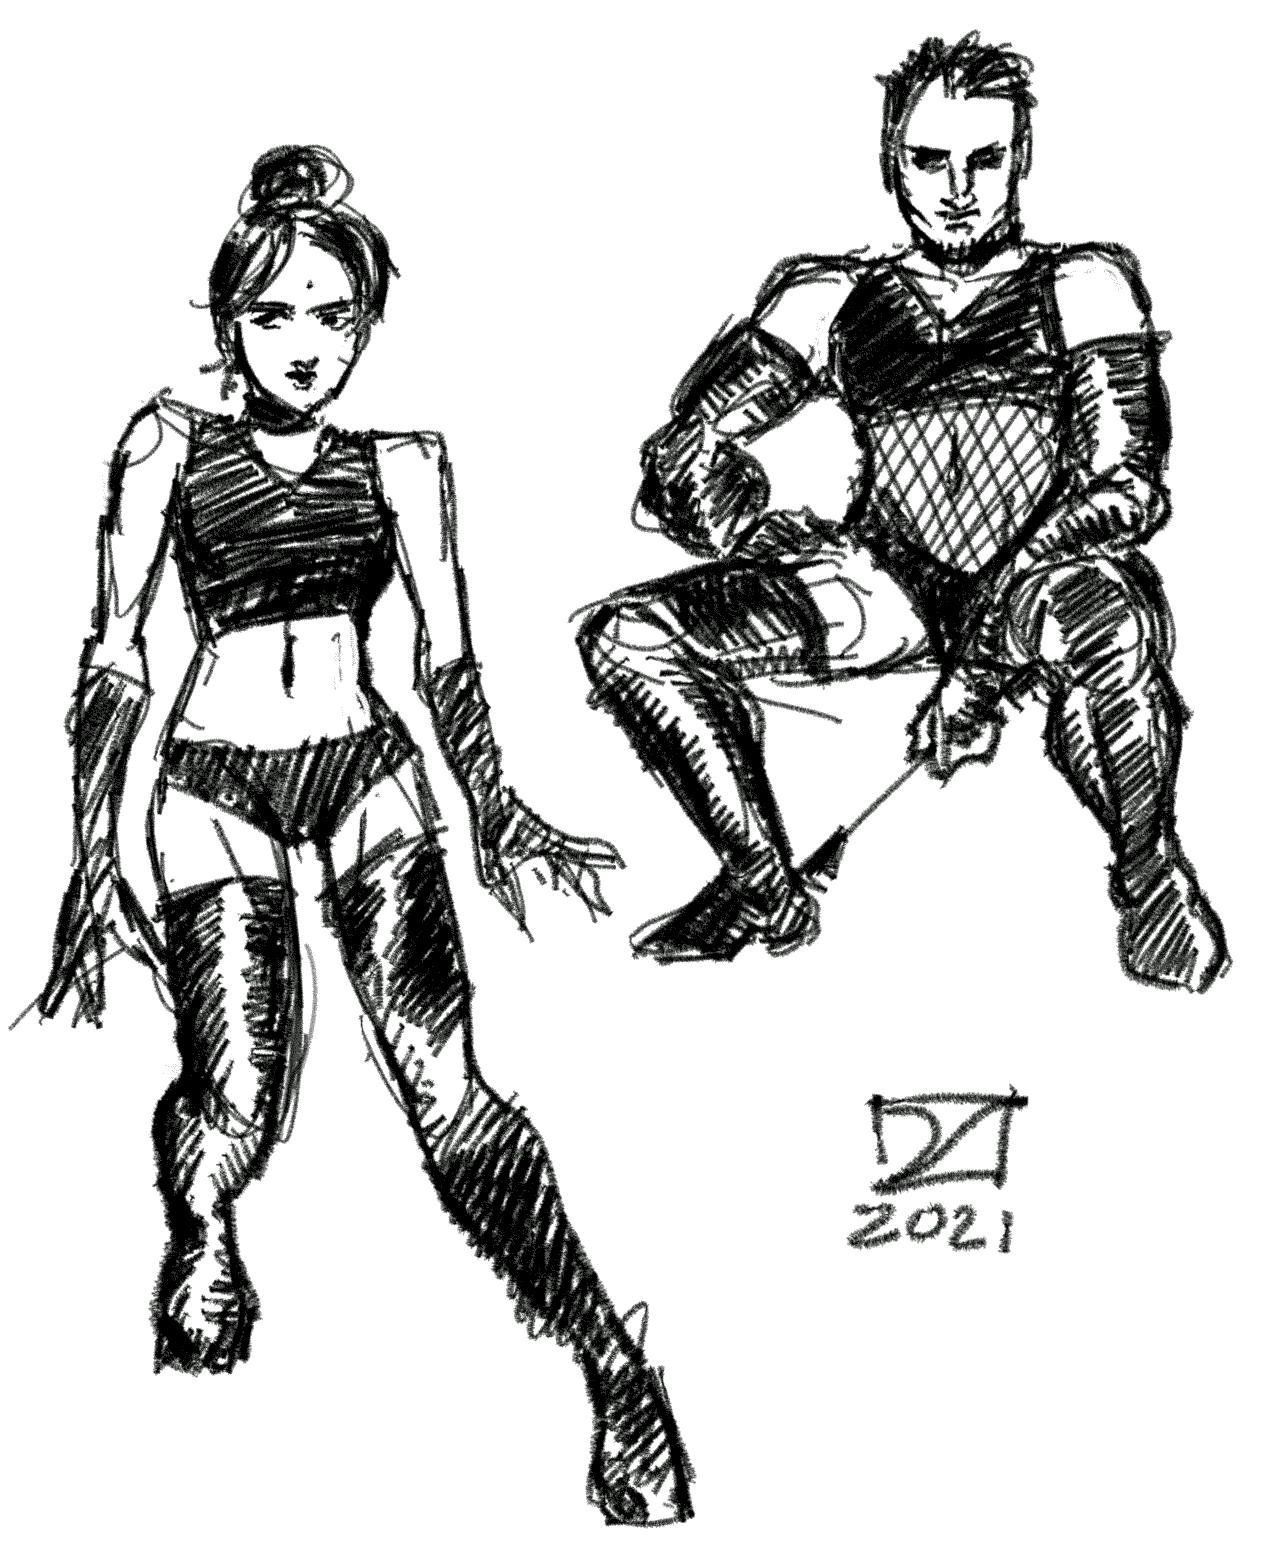 Shitty BDSM Sketches